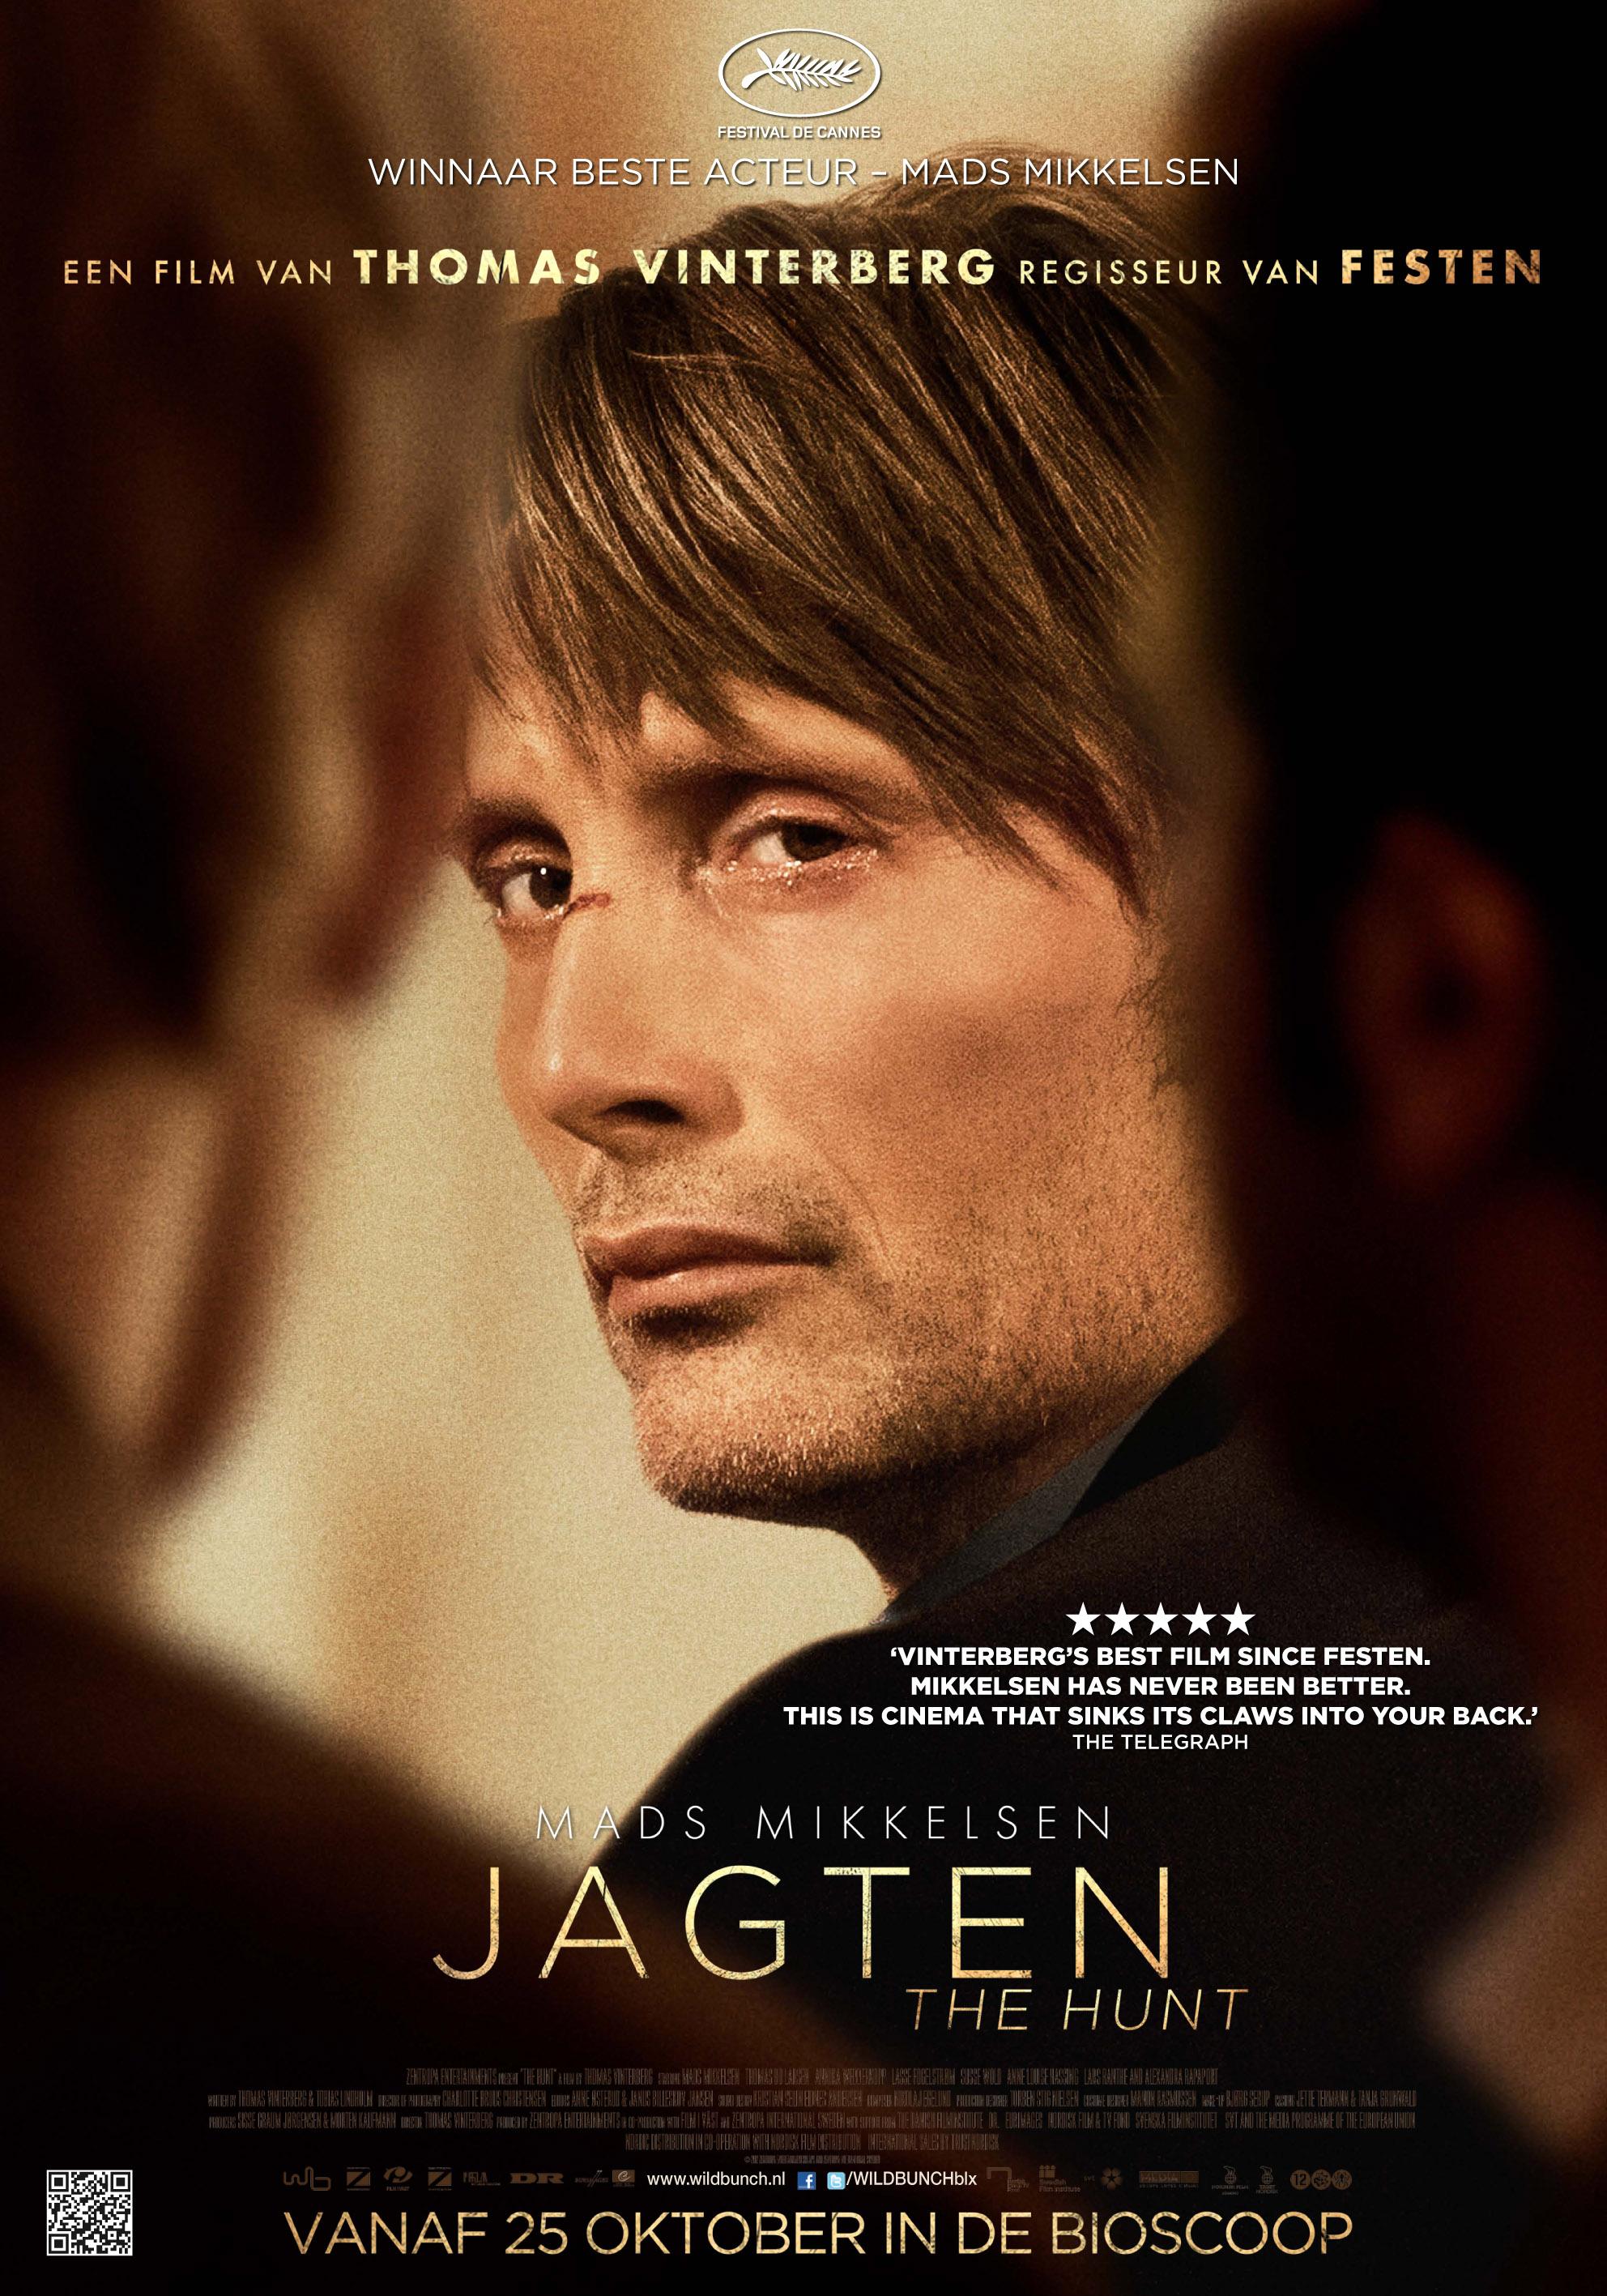 http://www.wildbunch.nl/film/poster/1344777002707_aed4a02ac8e4ca294b97becfdf8b1f31.jpg